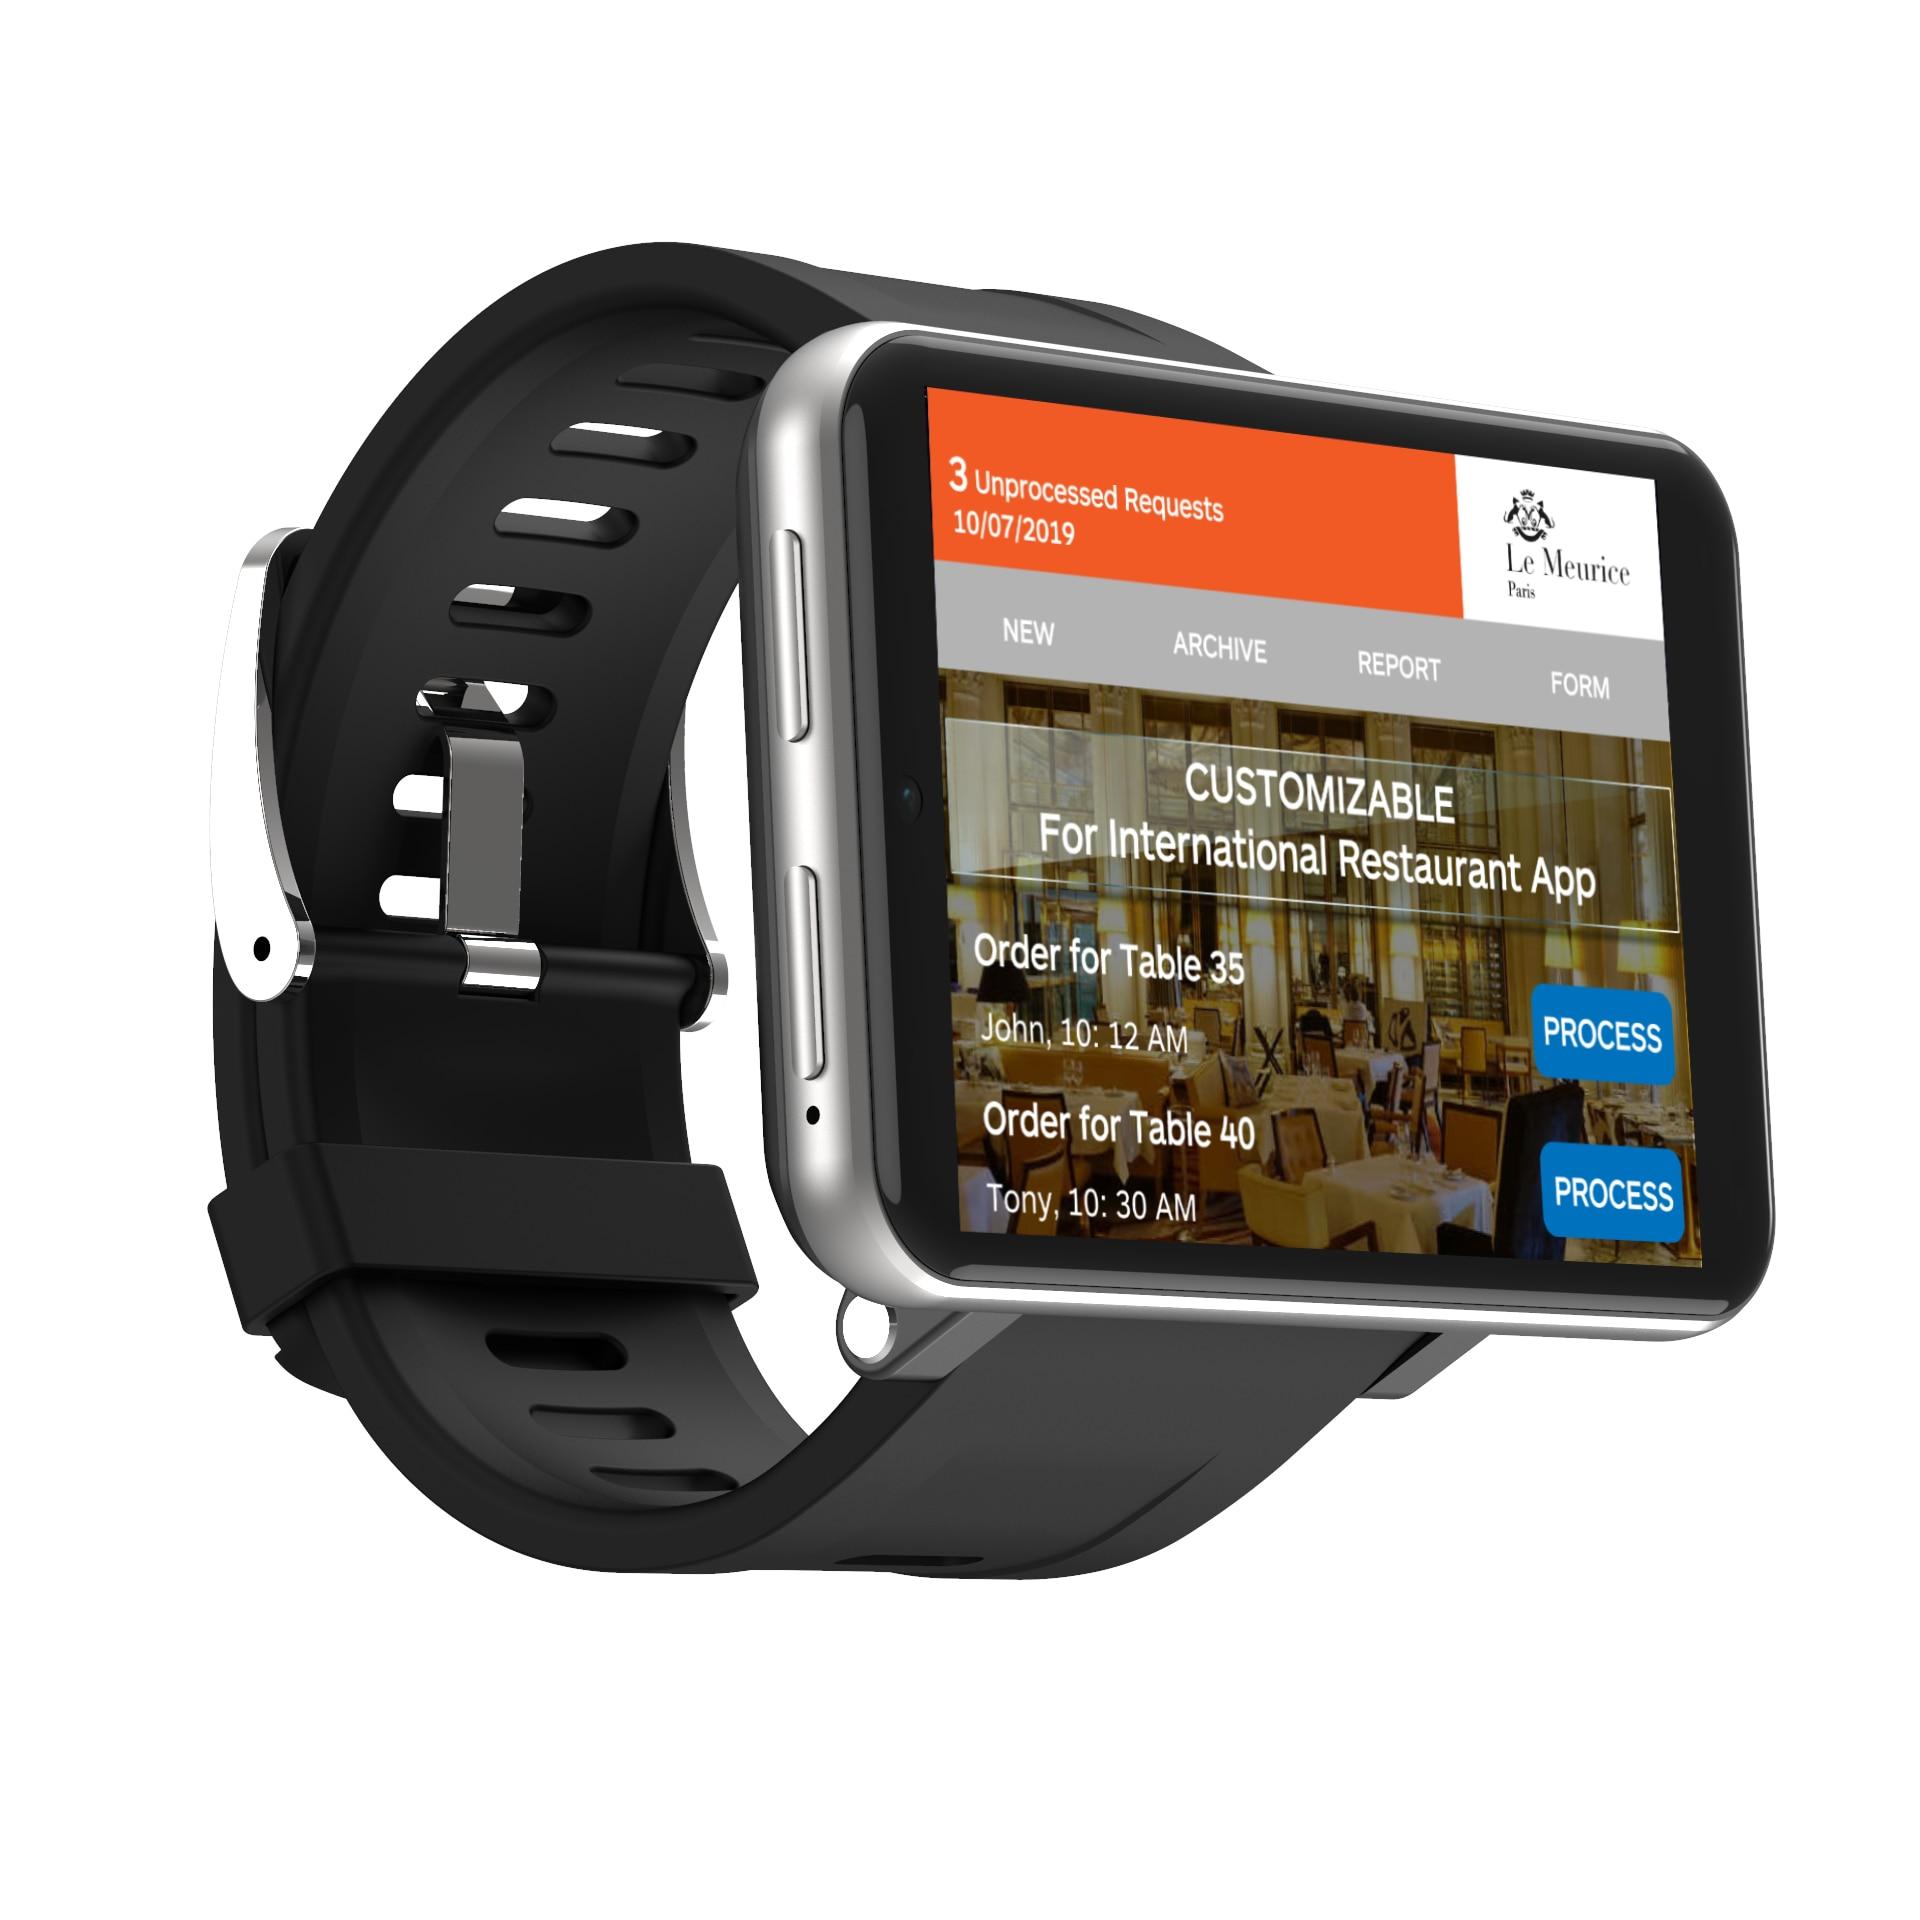 2700mah بطارية كبيرة smartwatch LEMFO LEMT 2.86 بوصة أندرويد 7.1 3GB + 32GB بطاقة SIM لتحديد المواقع واي فاي 4G ساعة ذكية